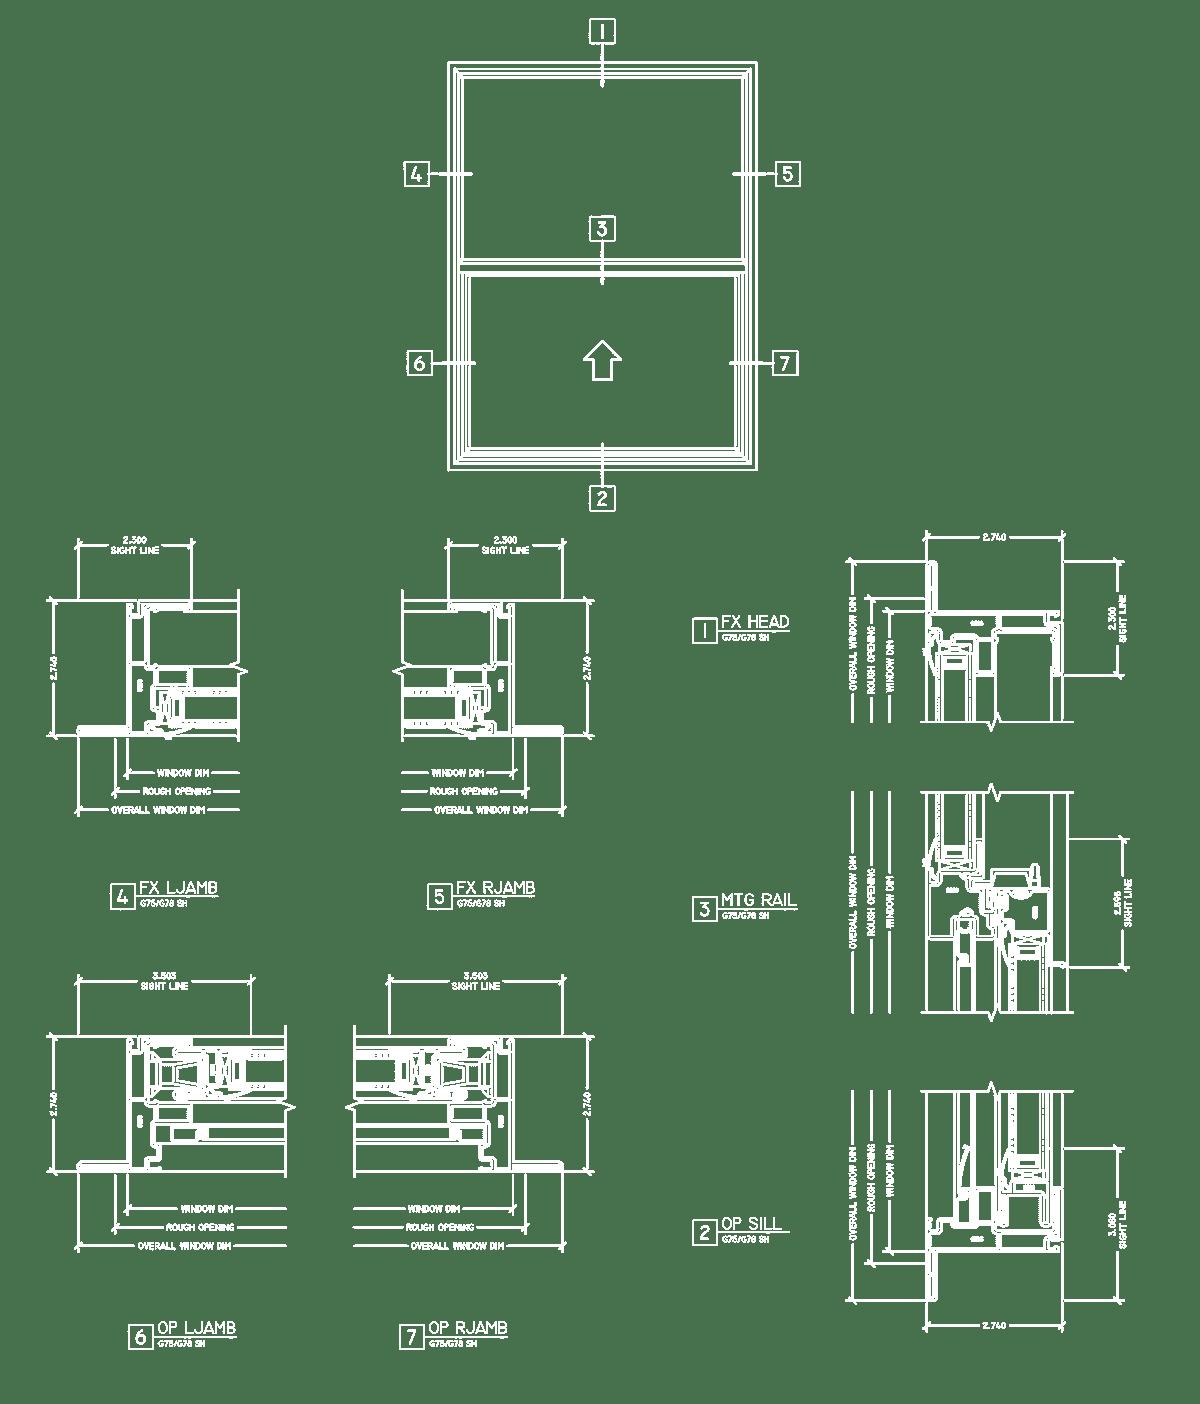 G75 Drawing